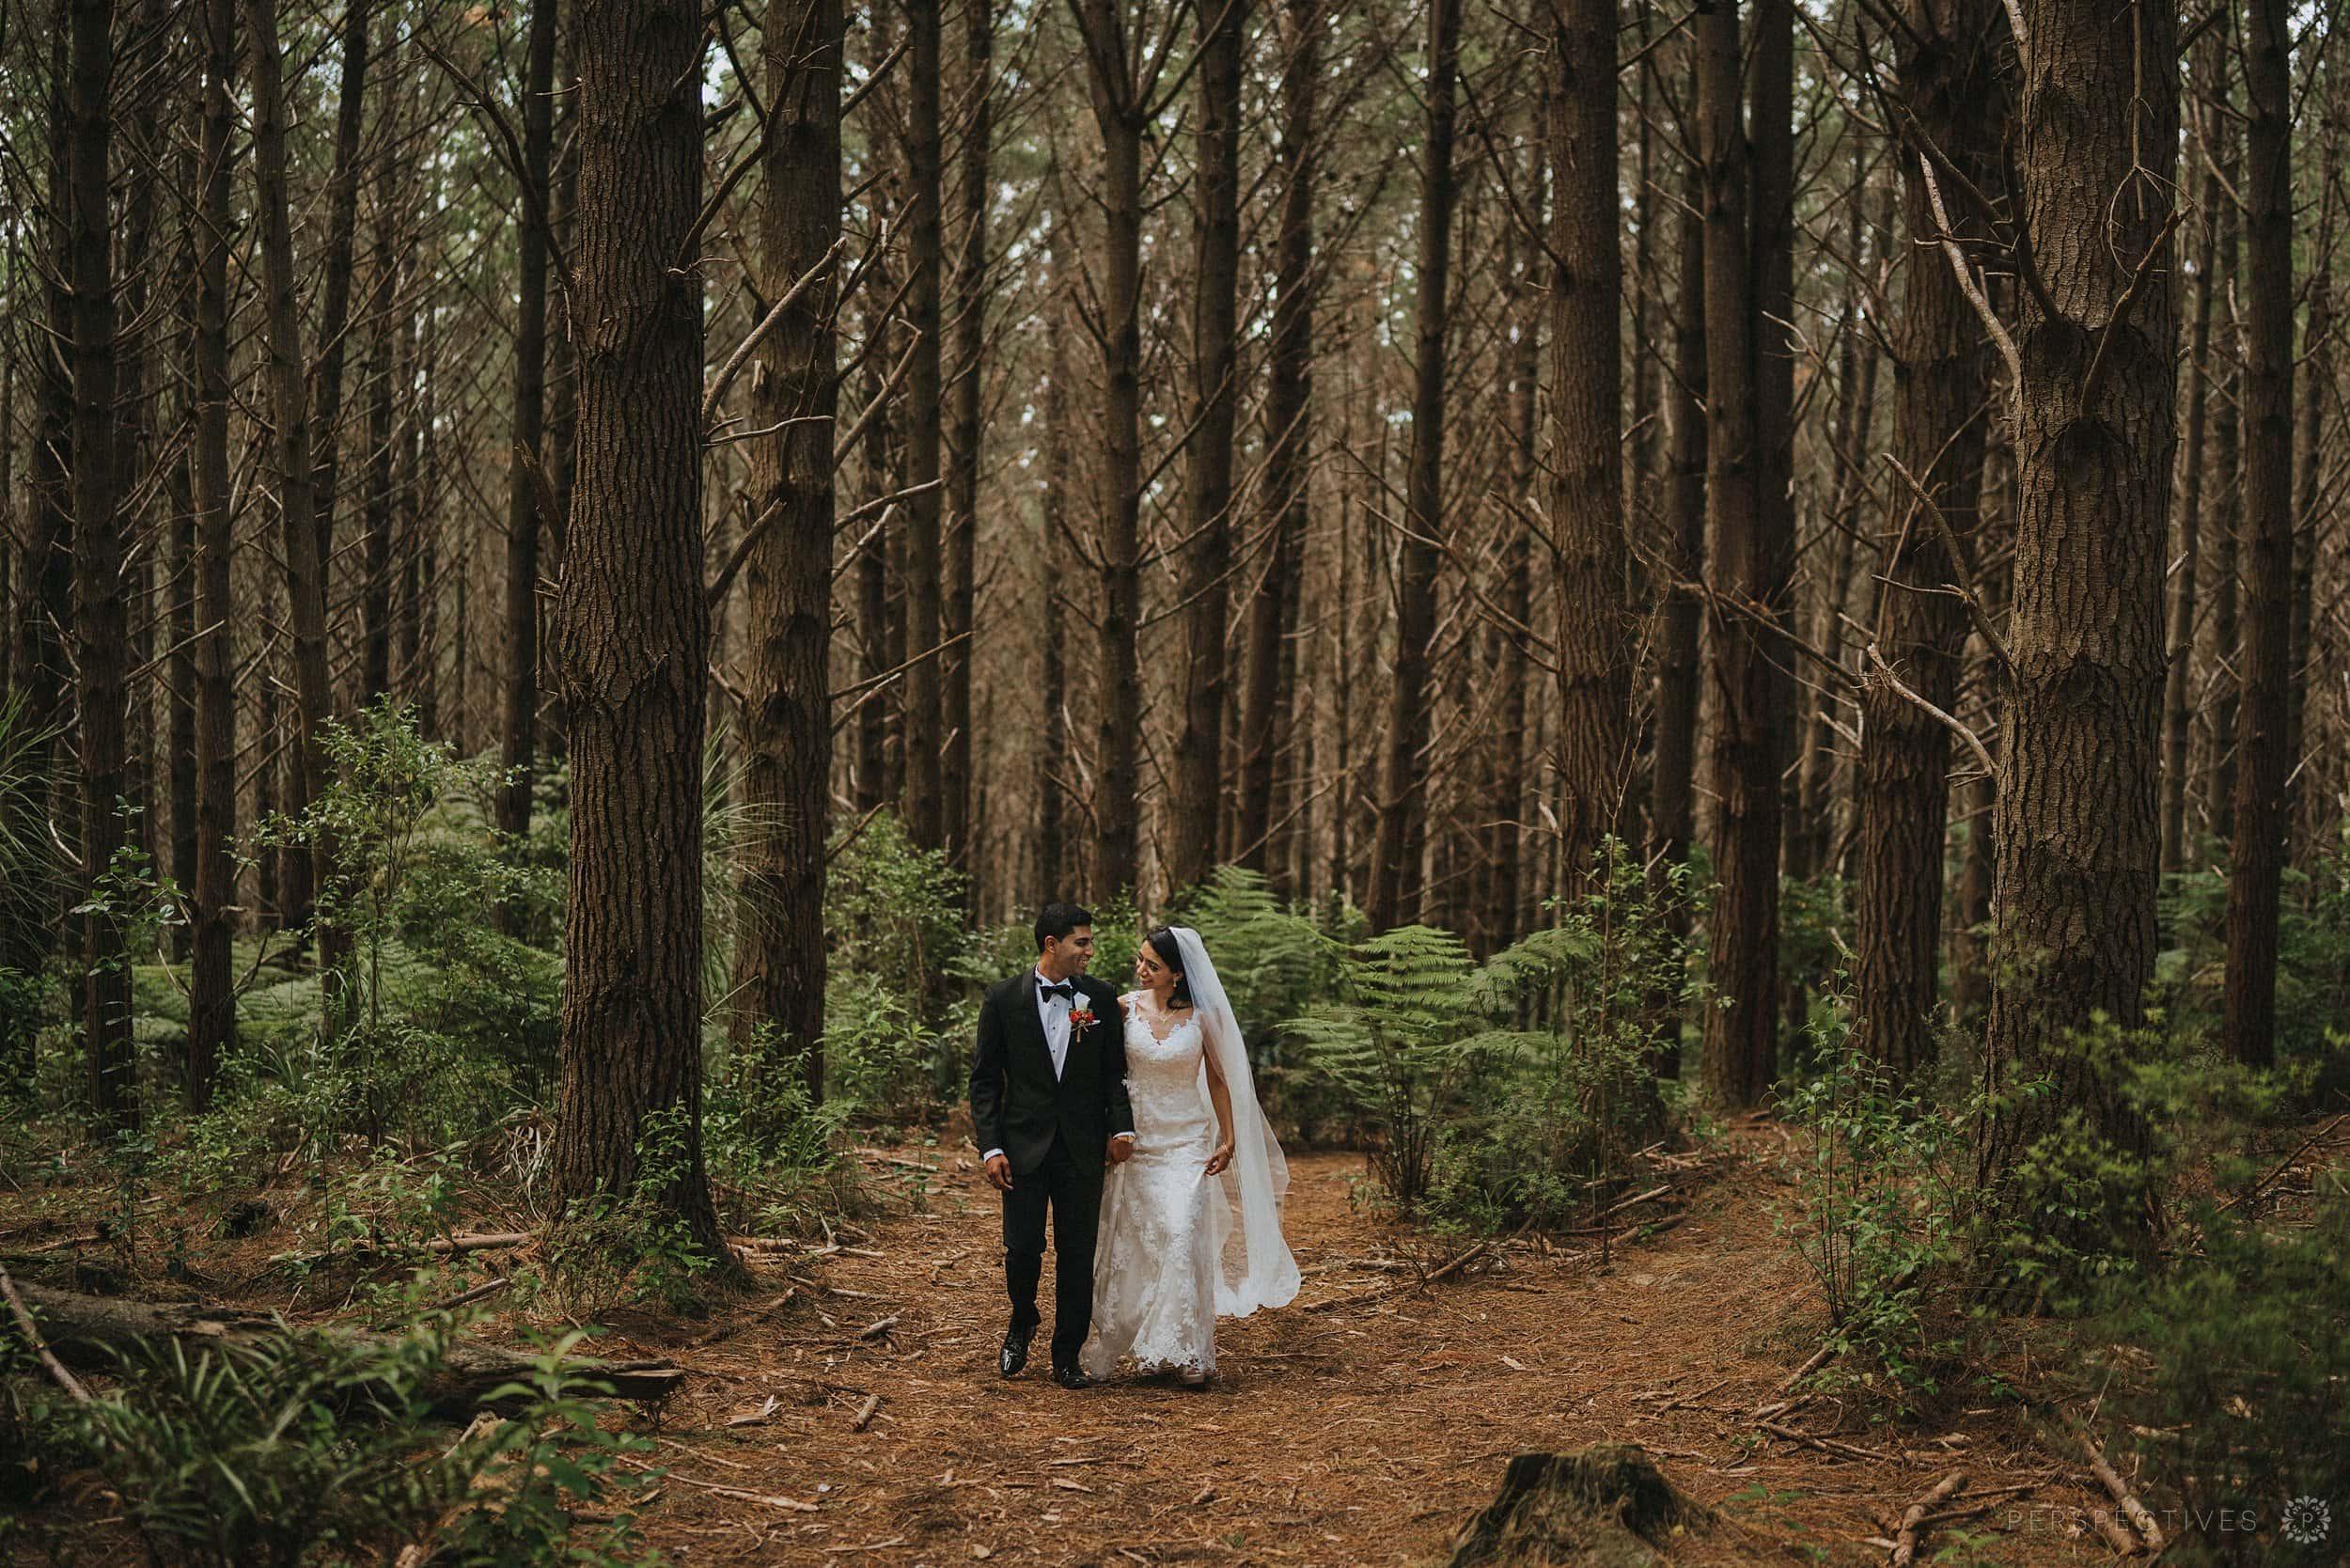 Forest wedding photo location Auckland Markovina